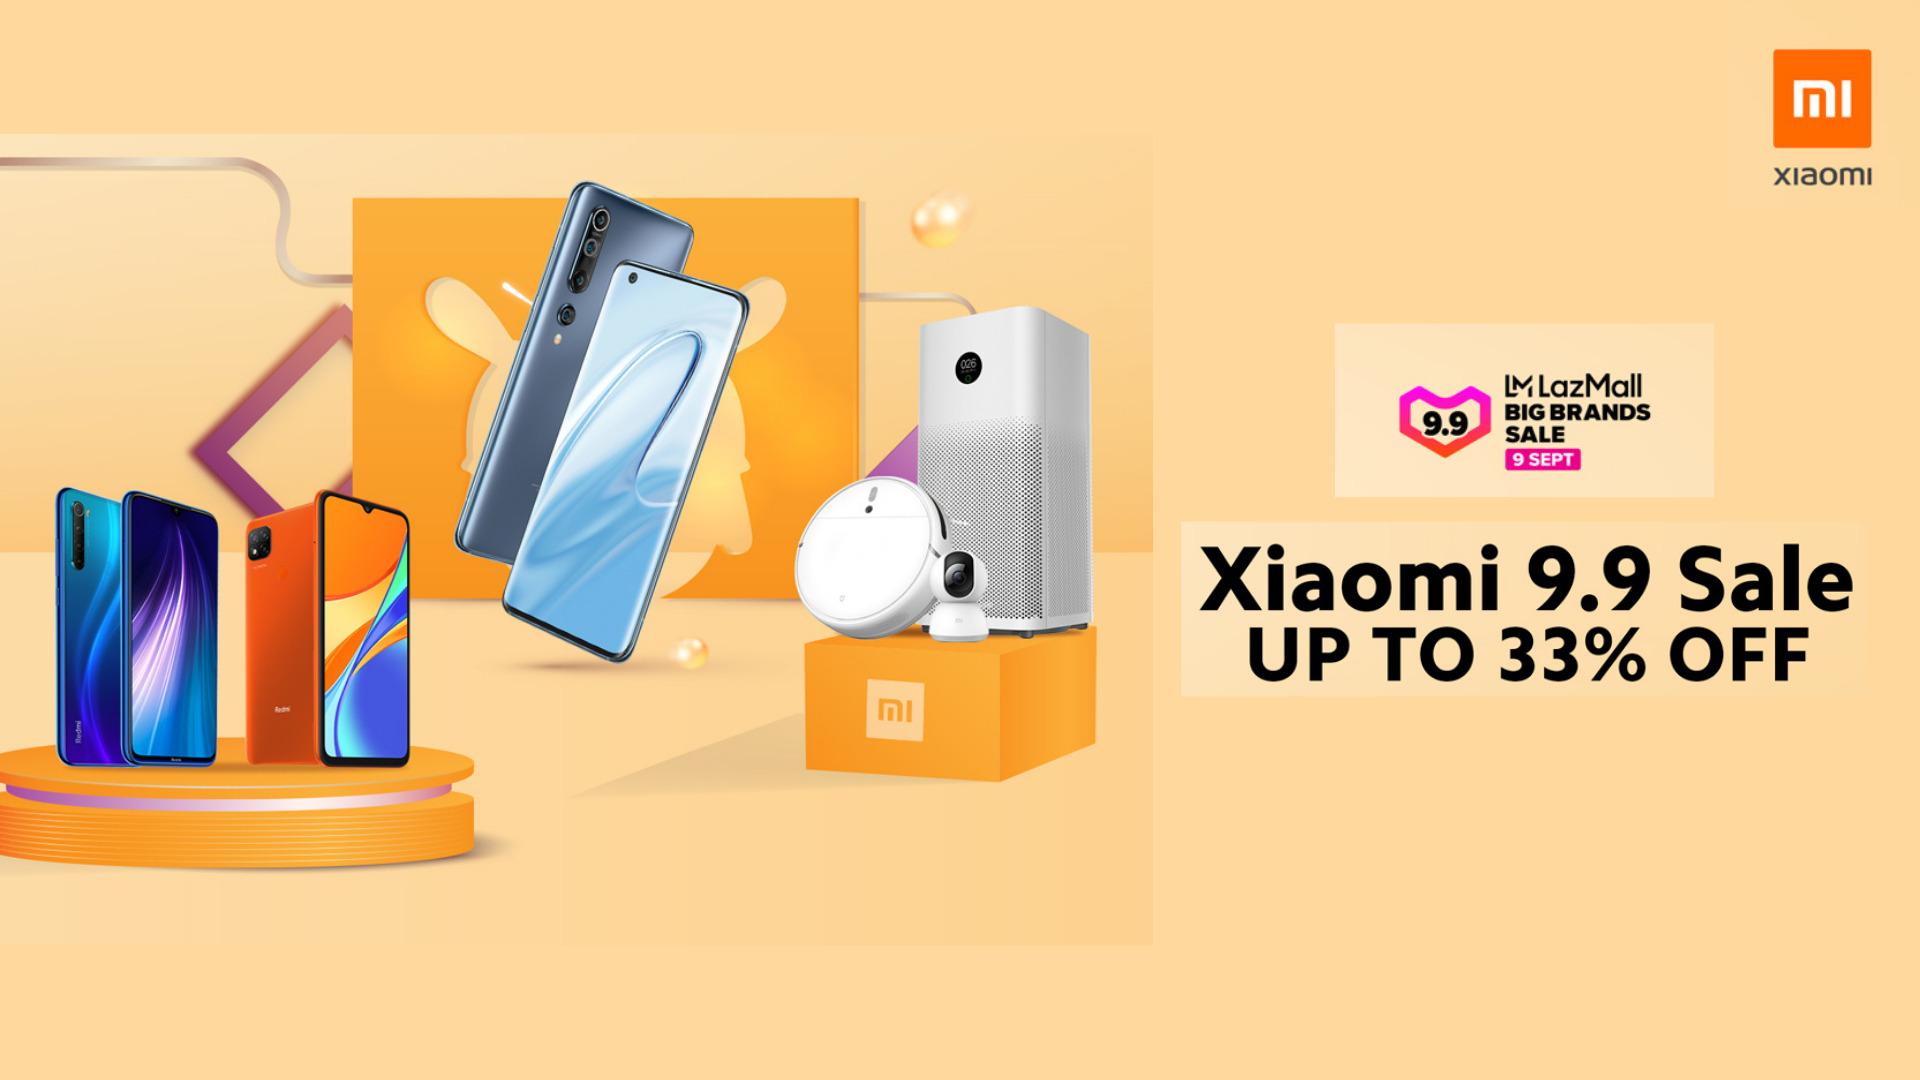 Xiaomi 9.9 Sale